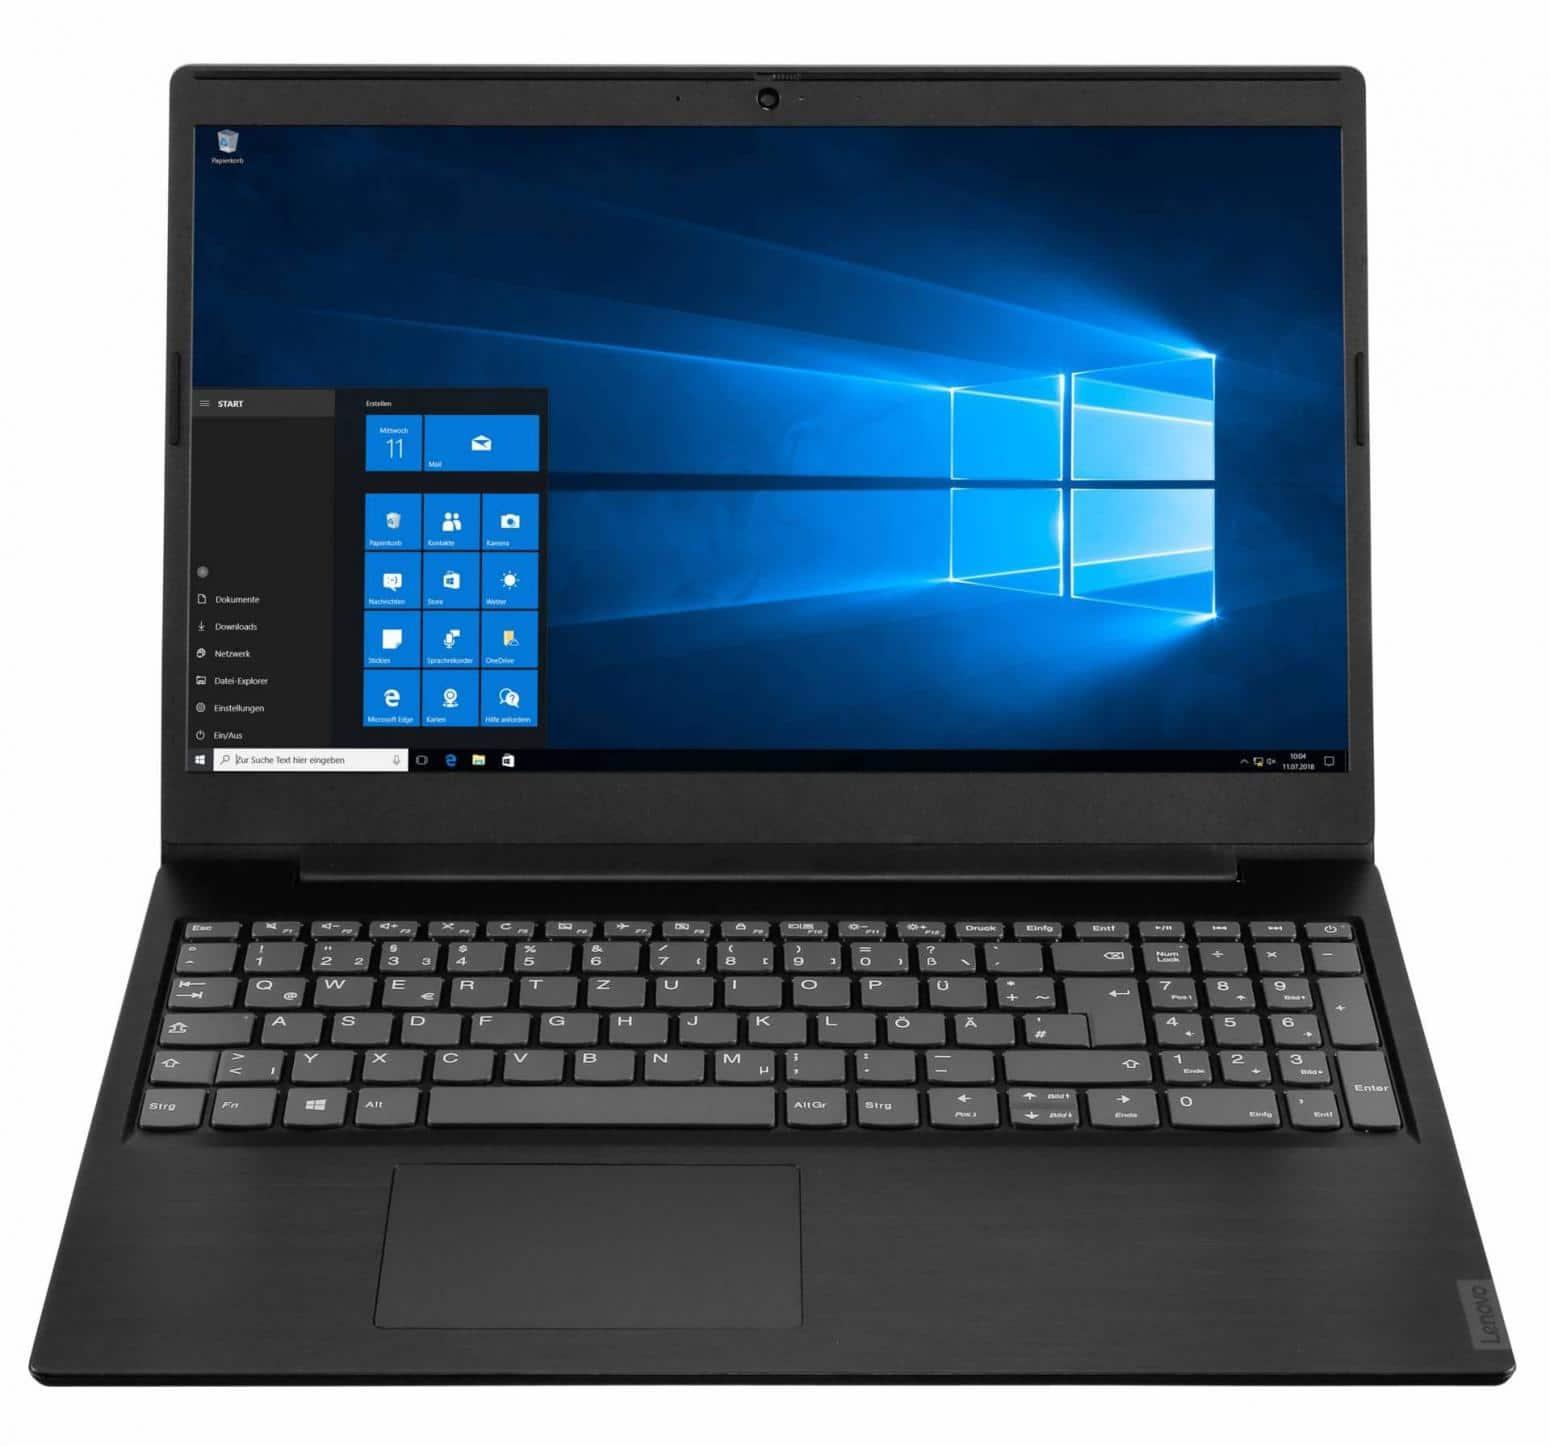 "Lenovo IdeaPad L340-15API, PC portable 15"" bureautique (409€)"